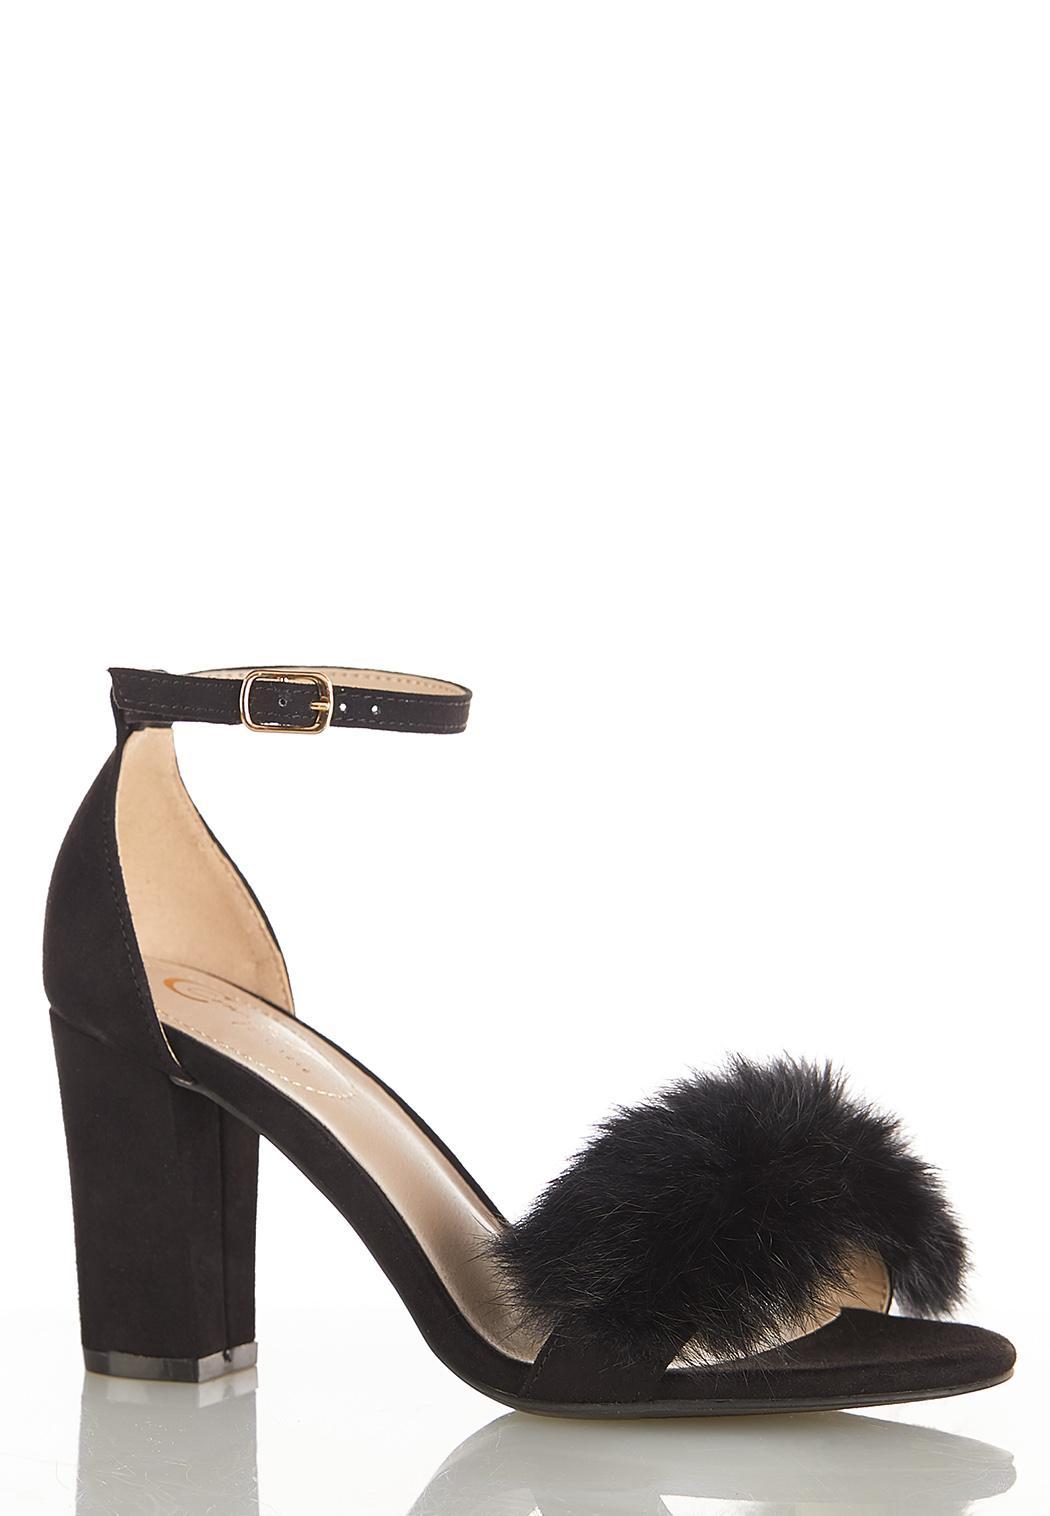 Fur Pom Heeled Sandals Heels Cato Fashions